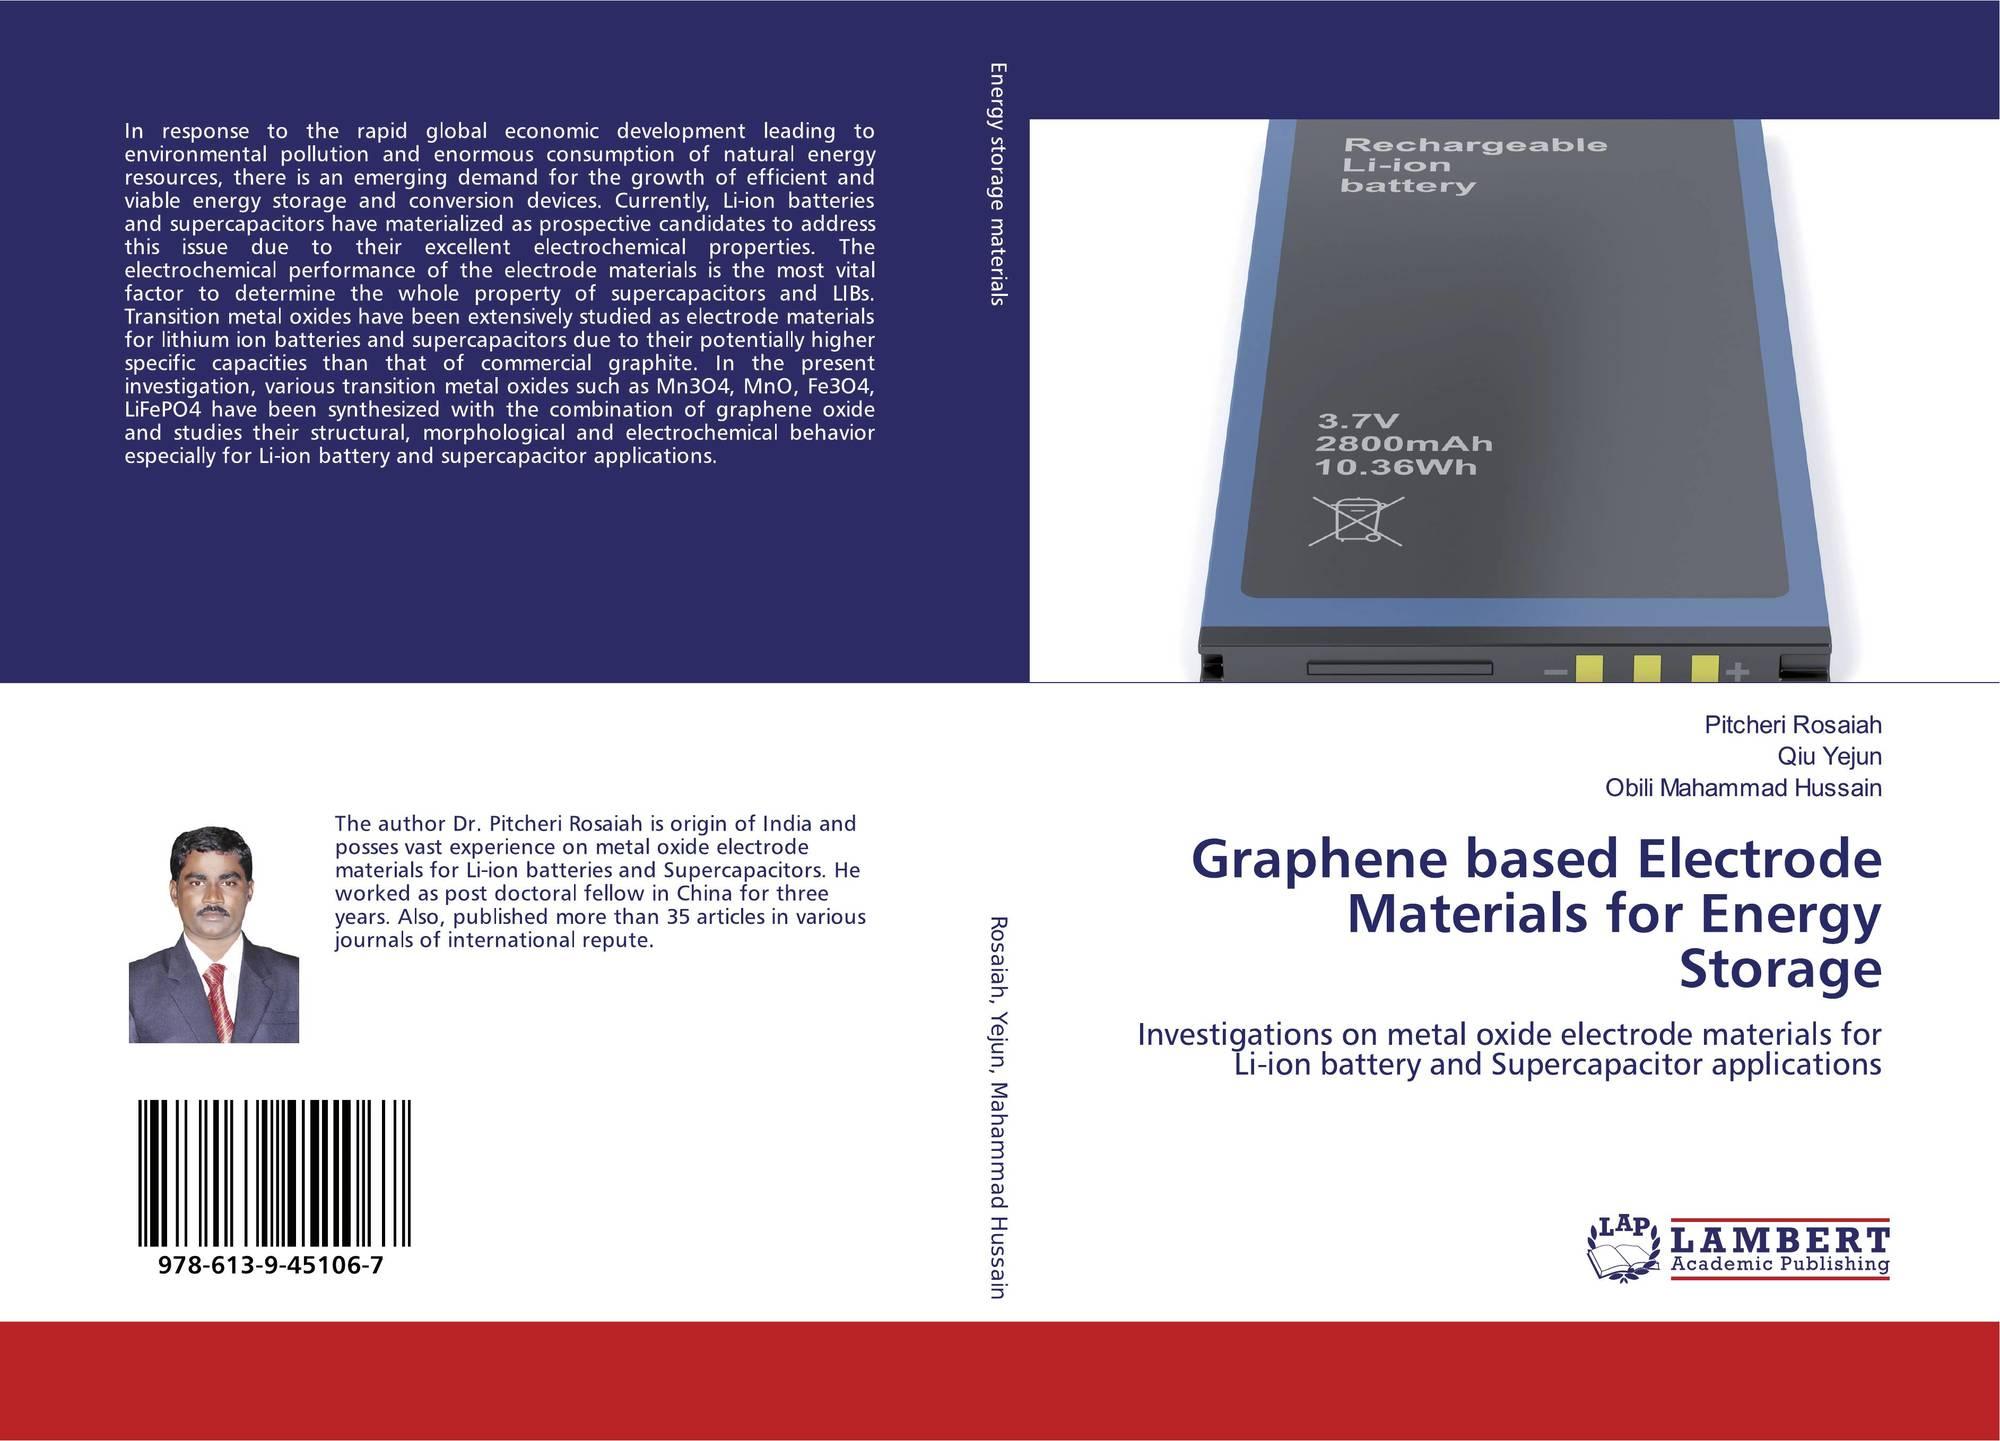 Graphene based Electrode Materials for Energy Storage, 978-613-9